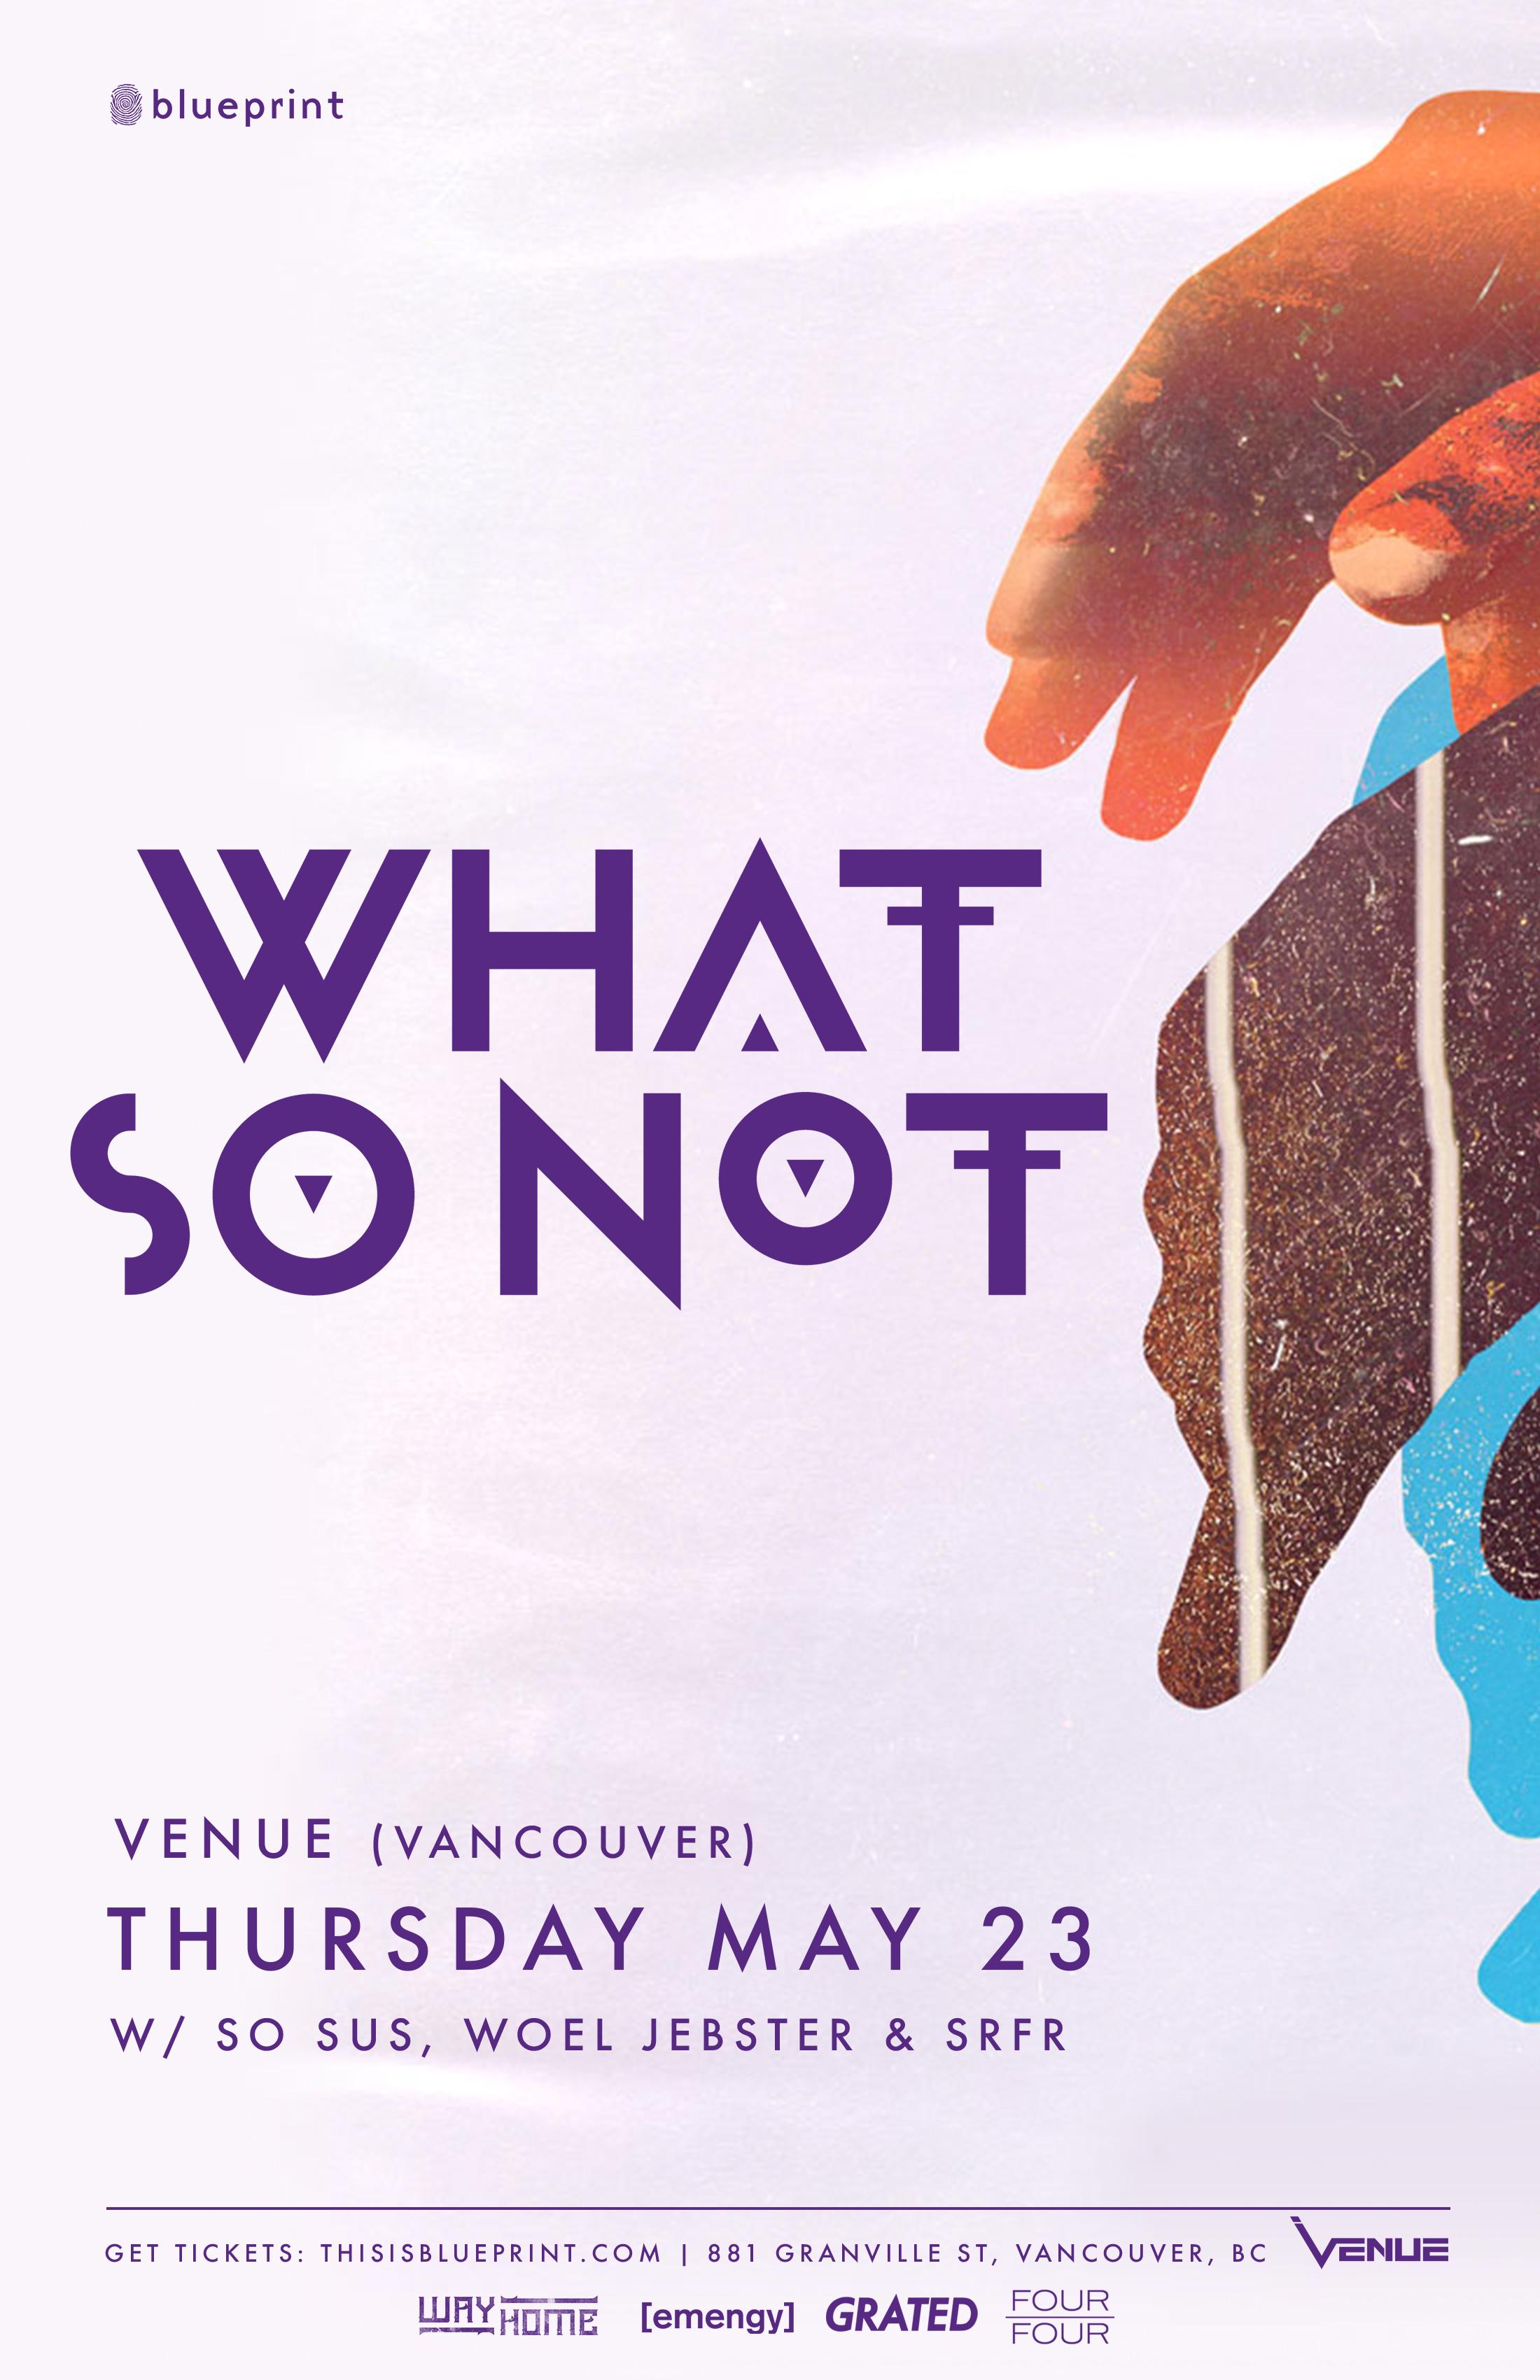 BP-What So not-Vancouver-11x17 w Openers.jpg